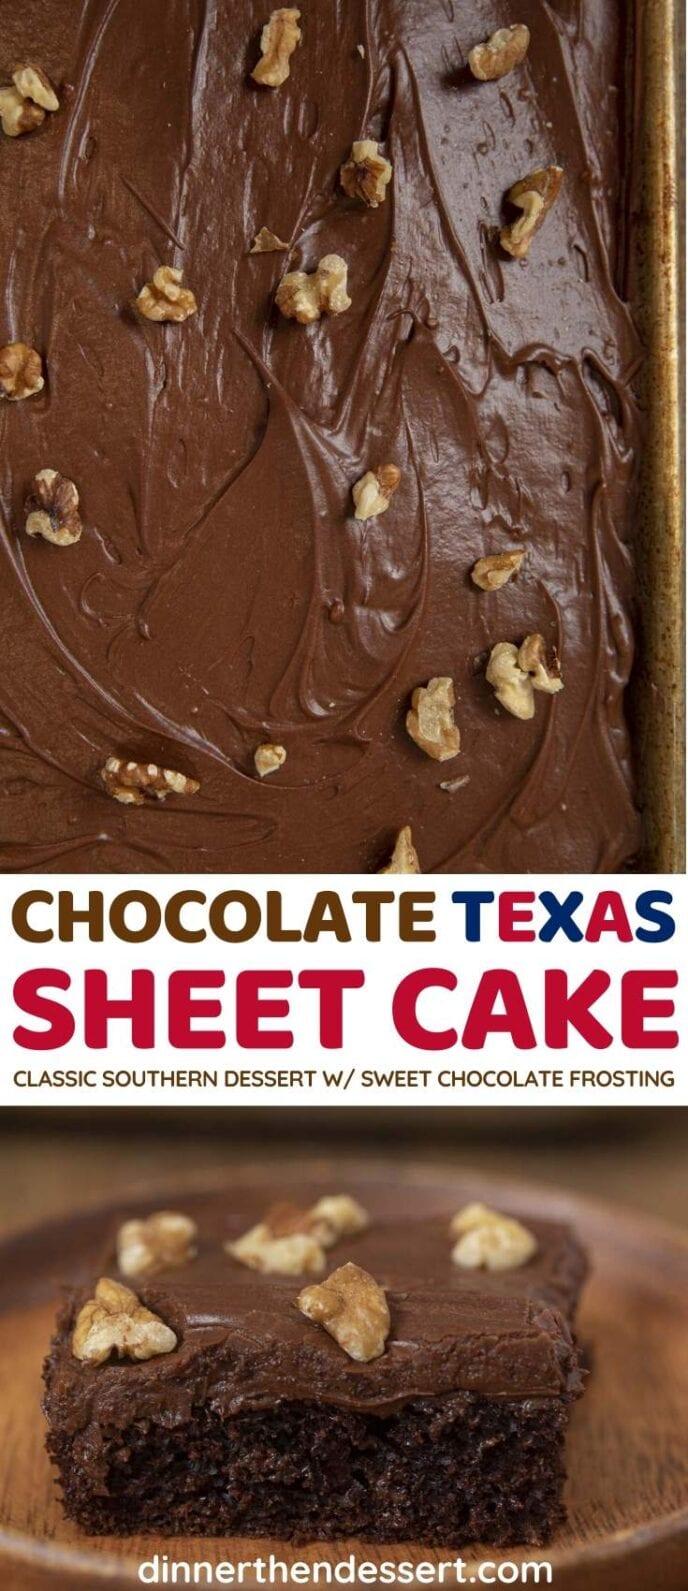 Chocolate Texas Sheet Cake collage